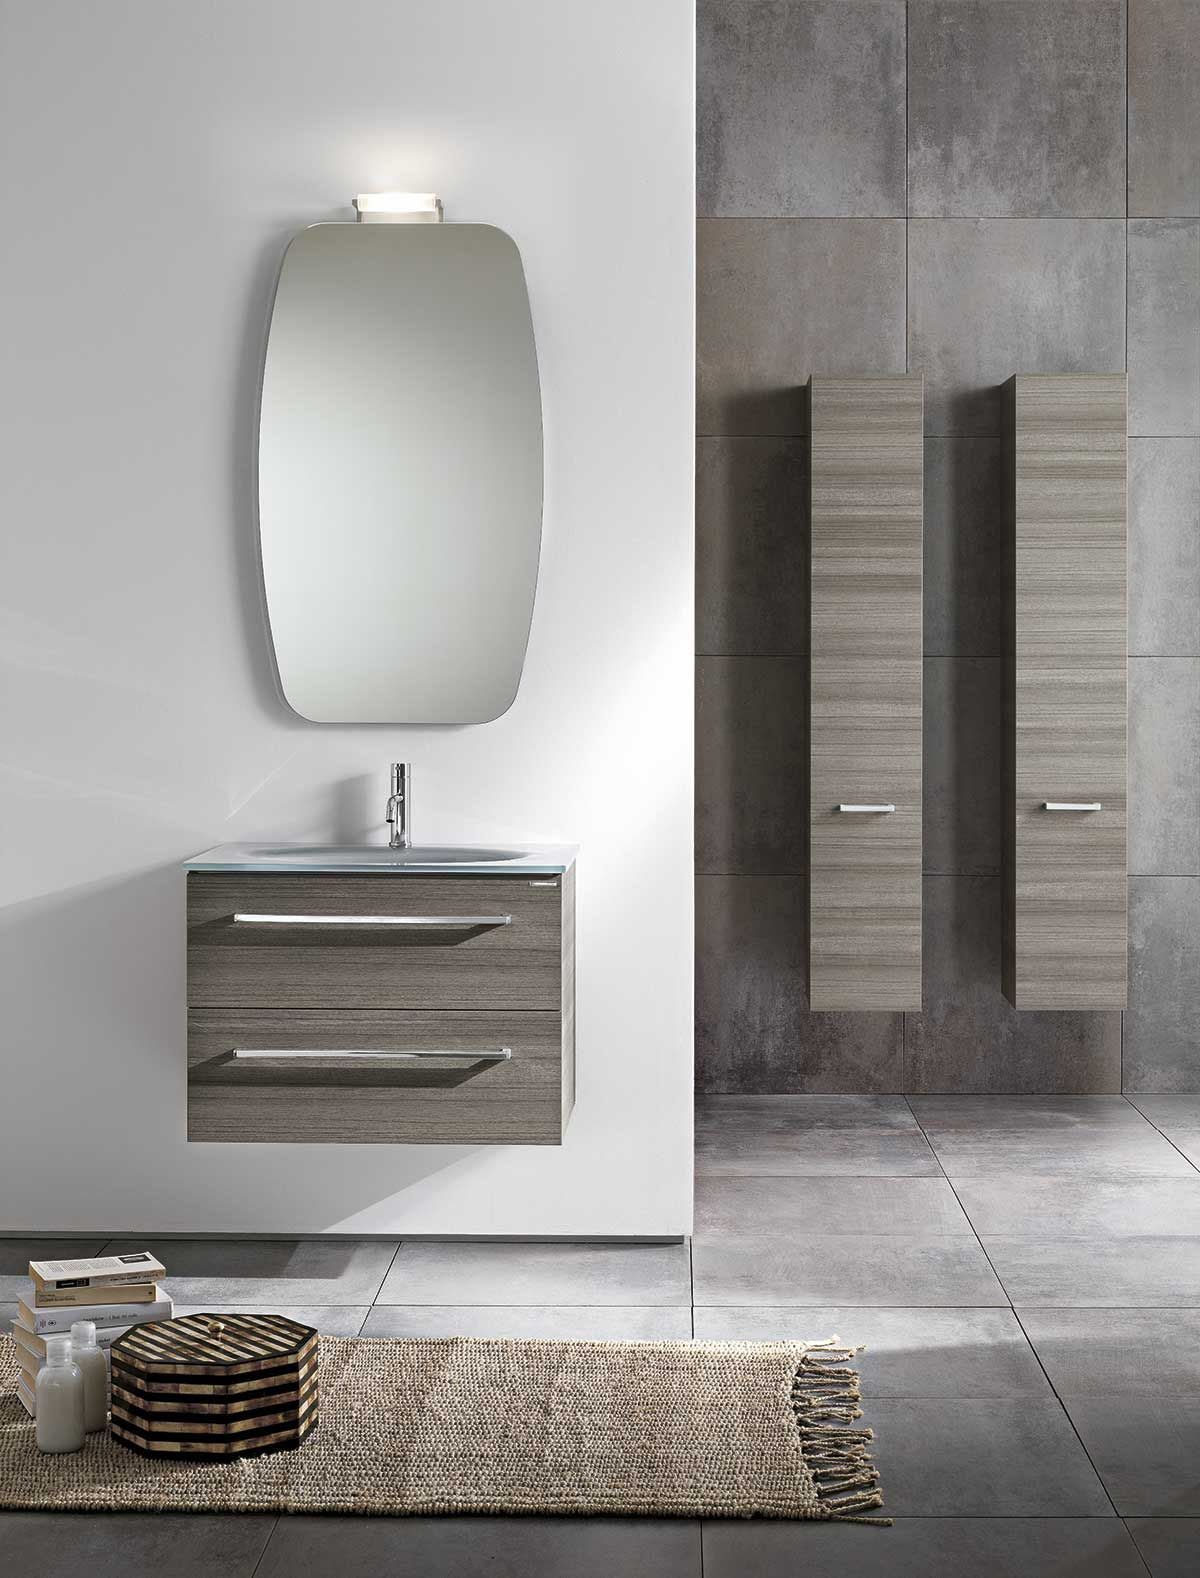 Berloni Bagno   Just   Berloni Bath Cabinetry   Pinterest   Italia ...